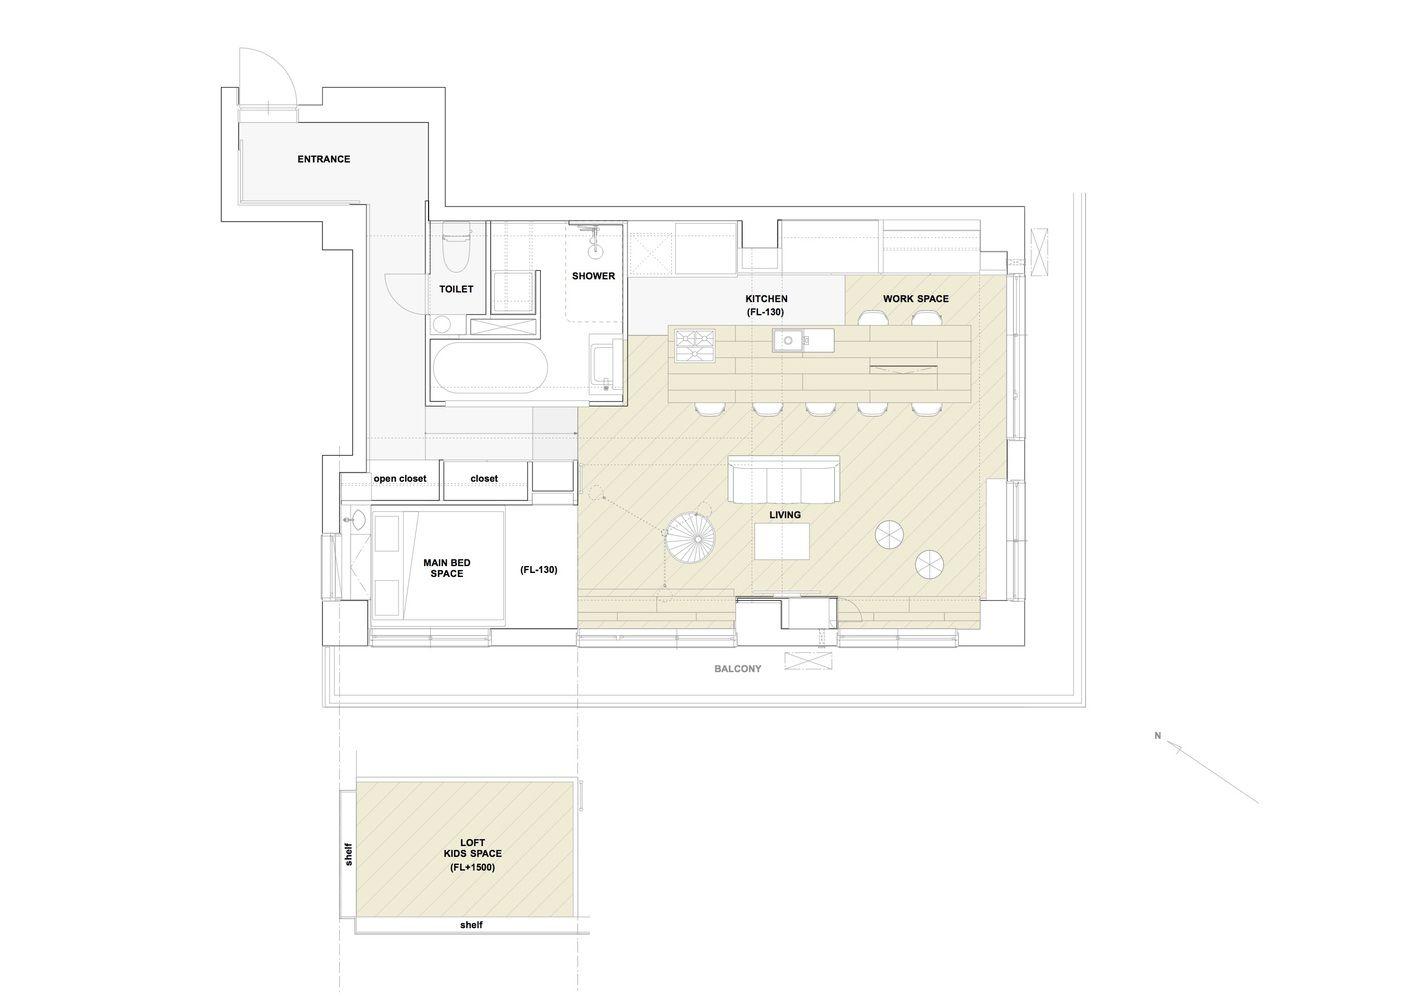 Gallery Of Tenhachi House 8 Tenhachi Architect Interior Design 16 Interior Design Tokyo Interior Architecture Design Interior